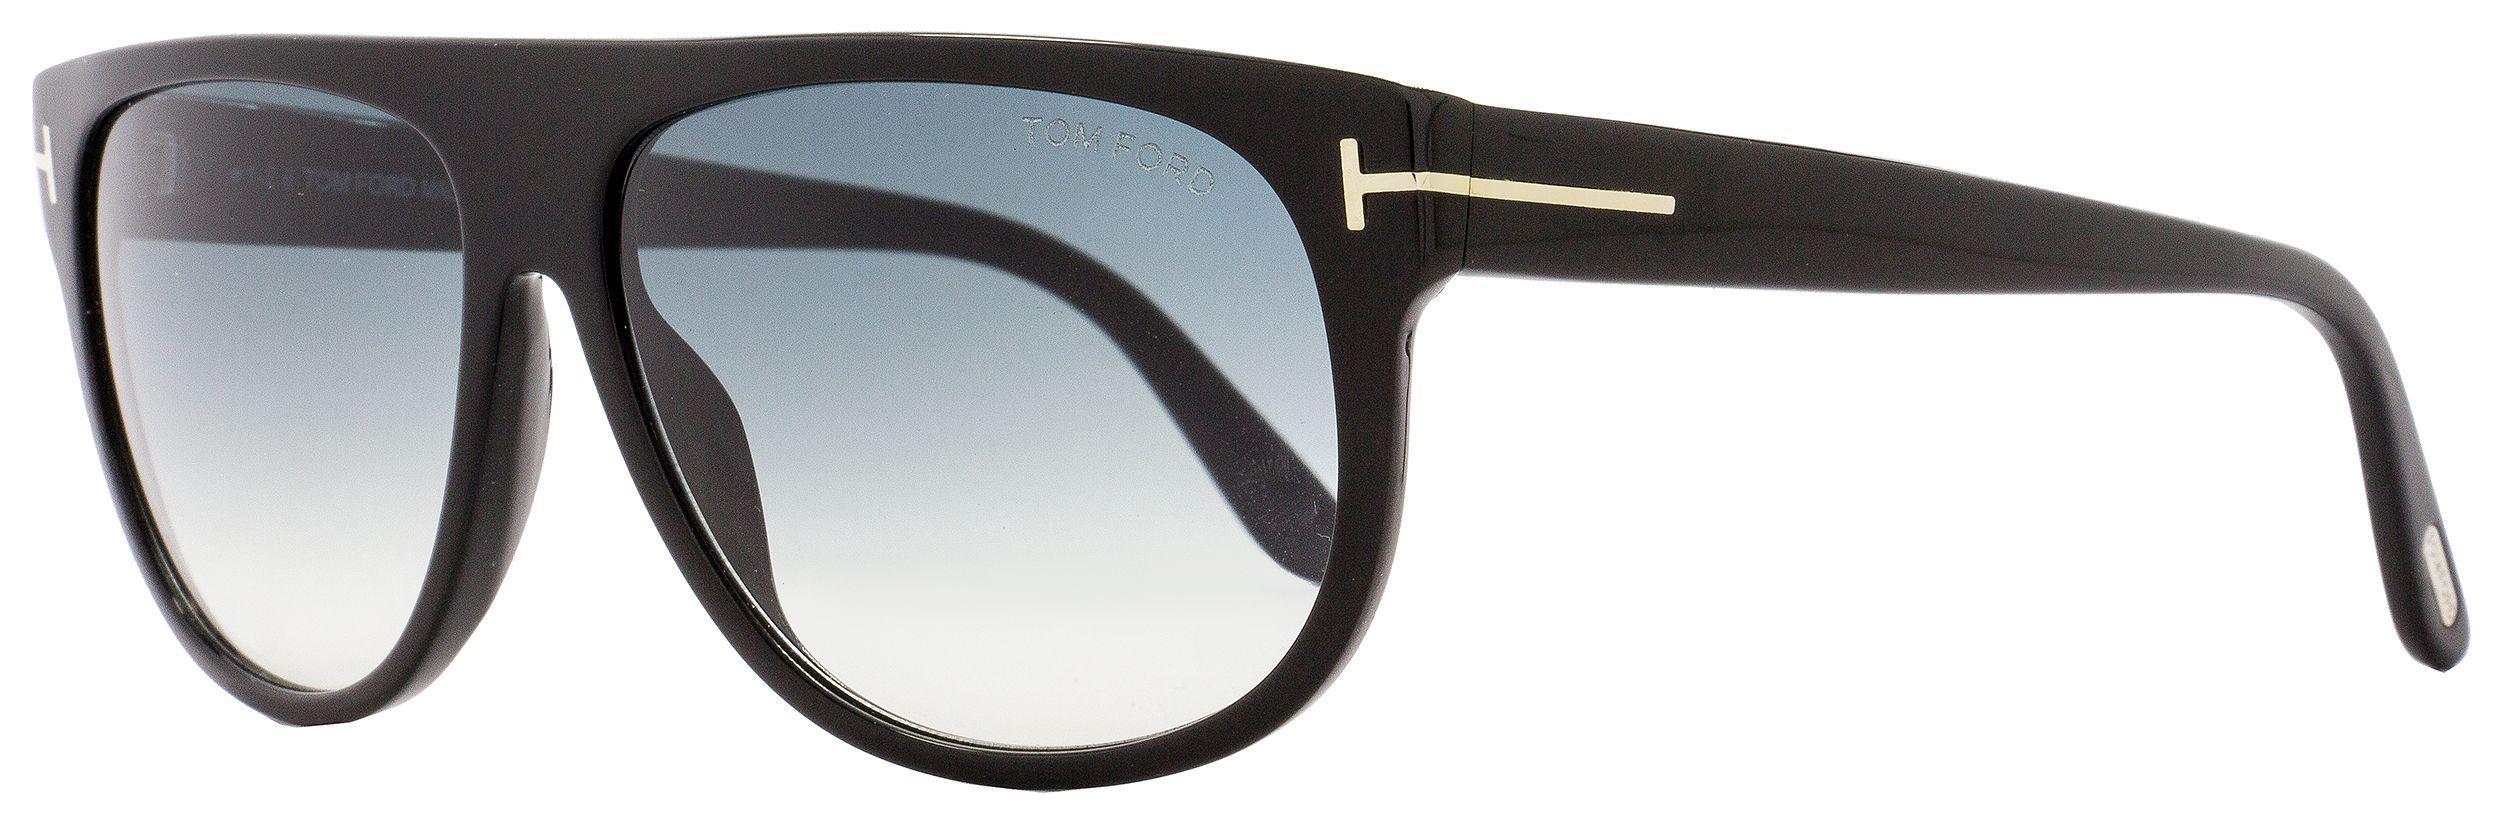 f937b95619 Lyst - Tom Ford Rectangular Sunglasses Tf375 Kristen 02n Shiny Black ...